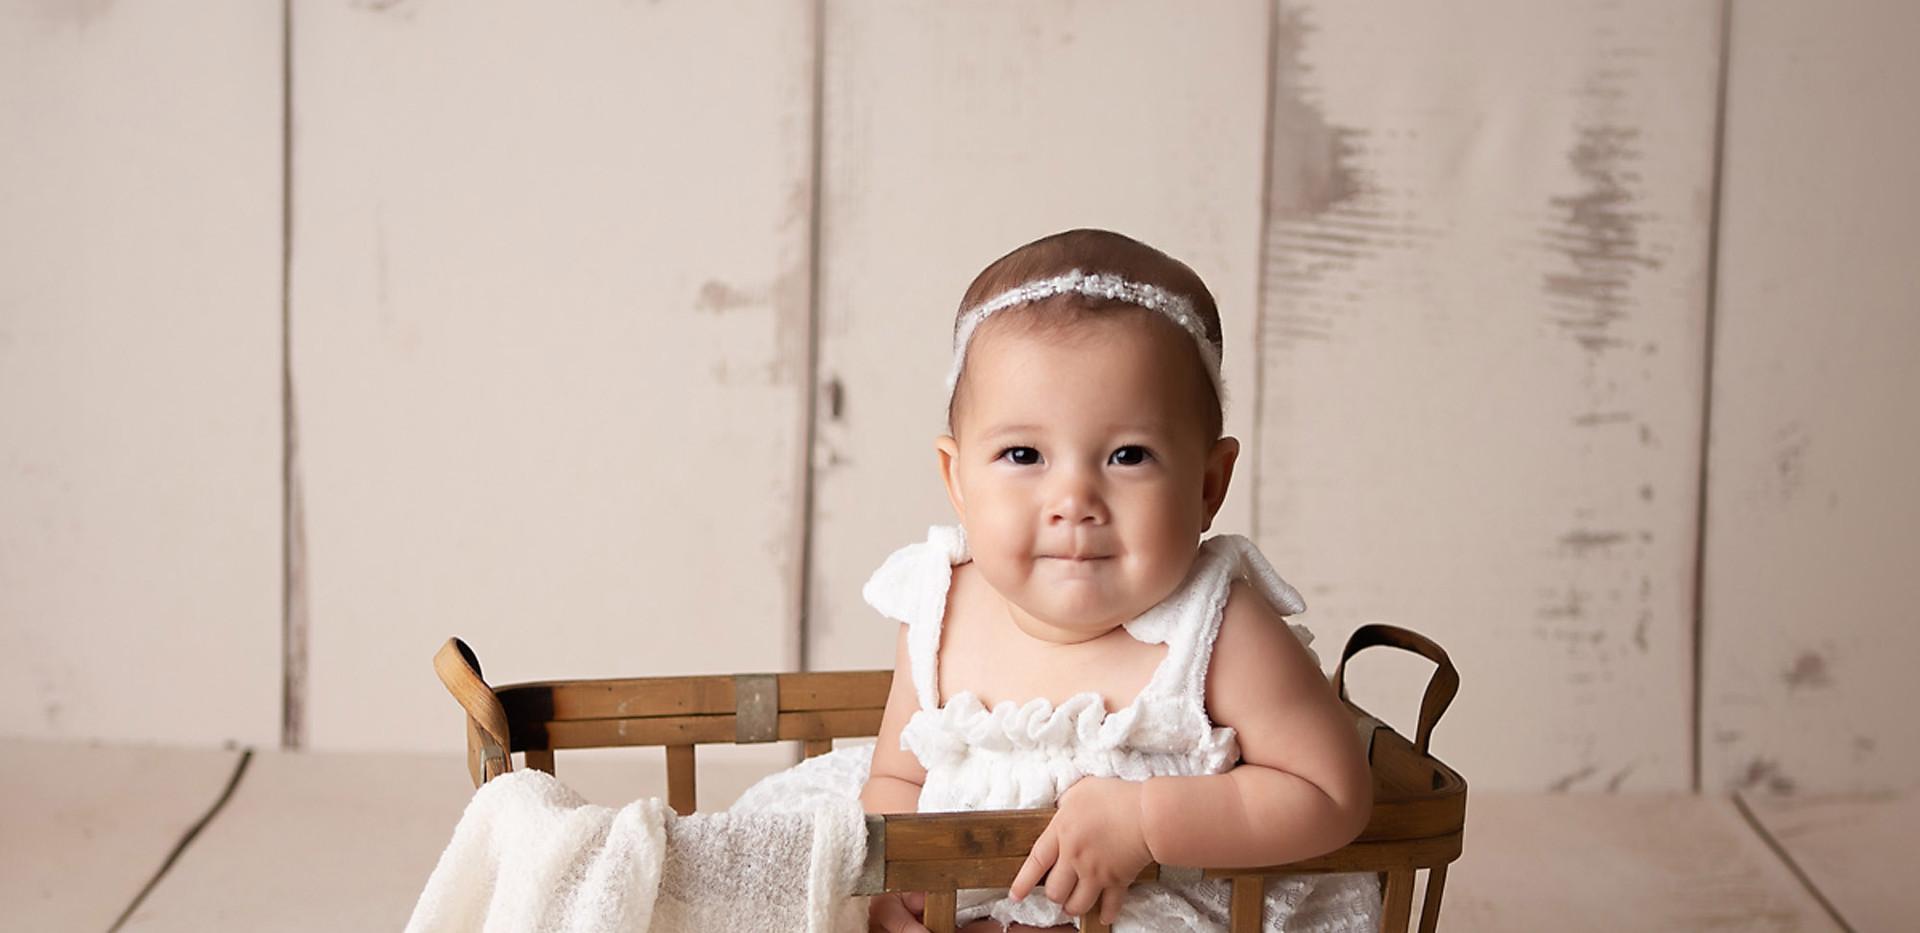 baby-photography-milestone-basket-white-